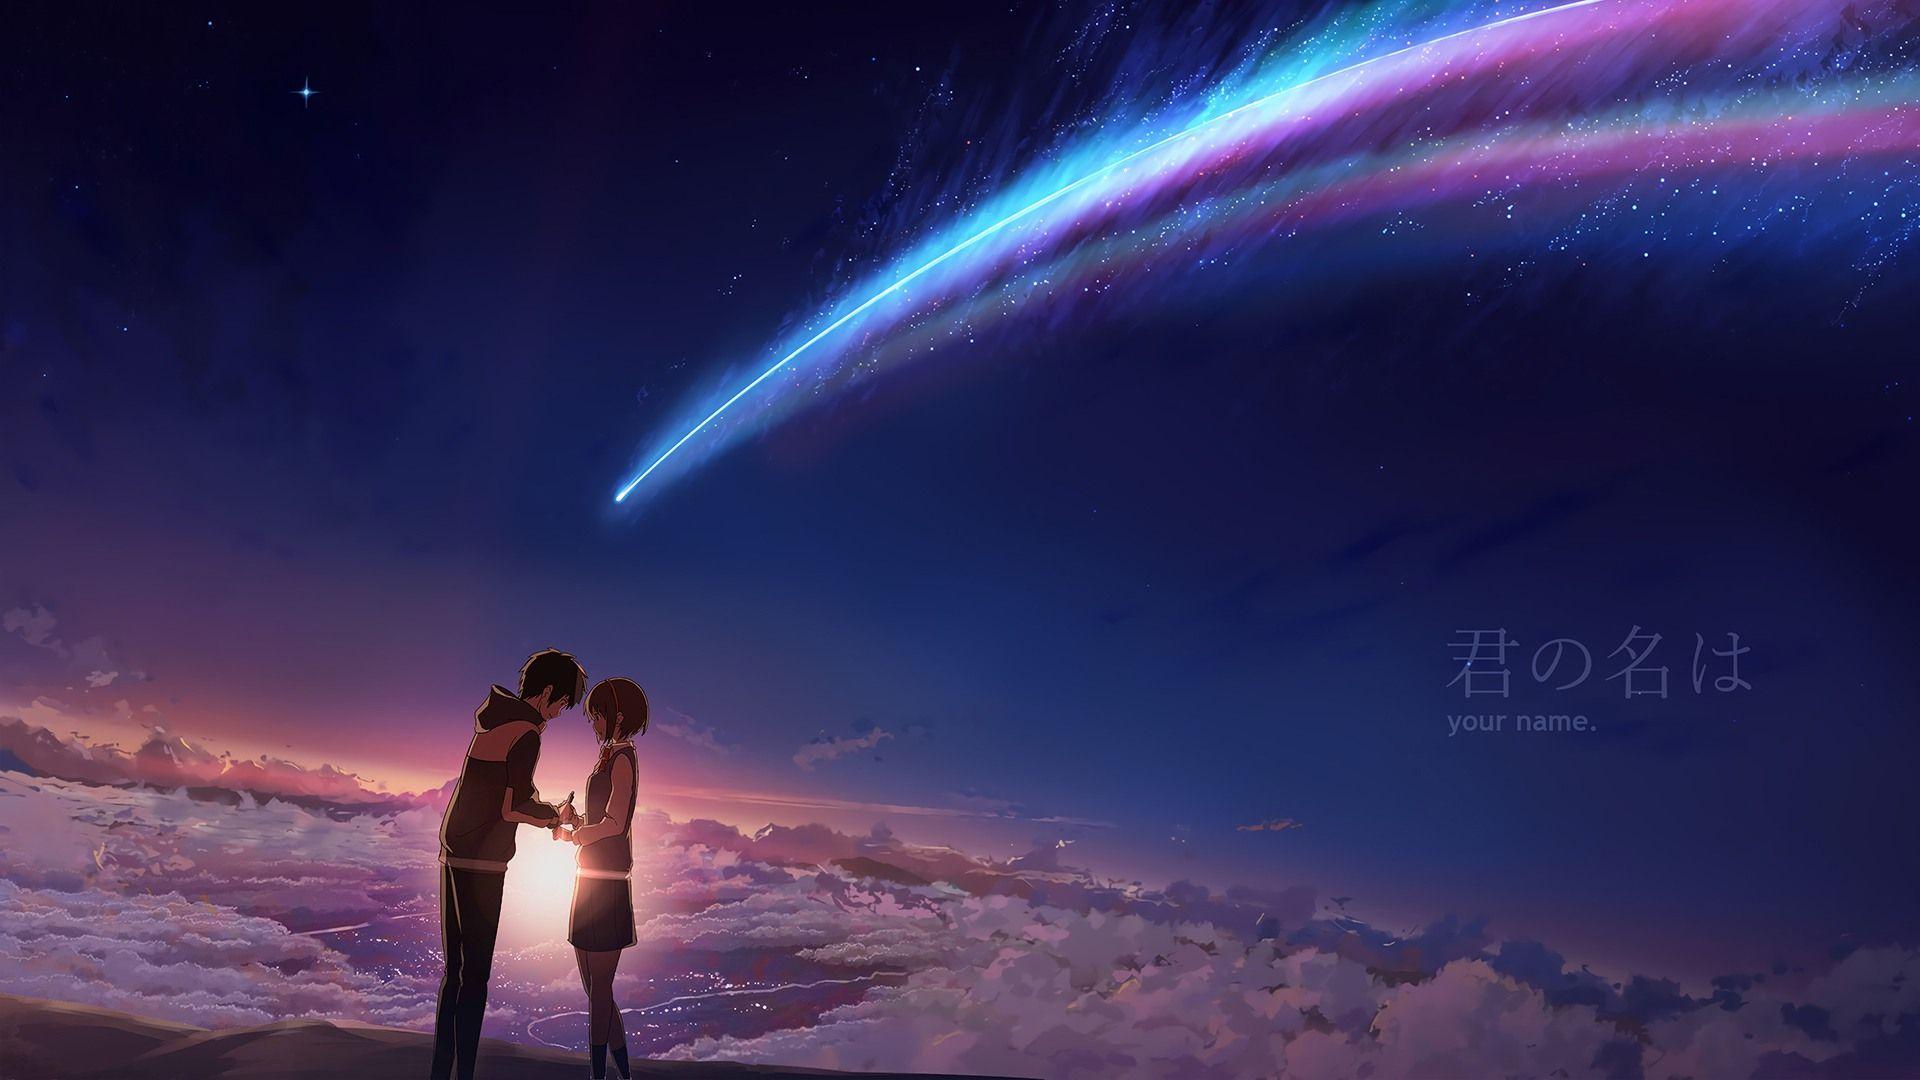 Taki and Mitsuha Your Name. Anime Sunrise Scenery Night